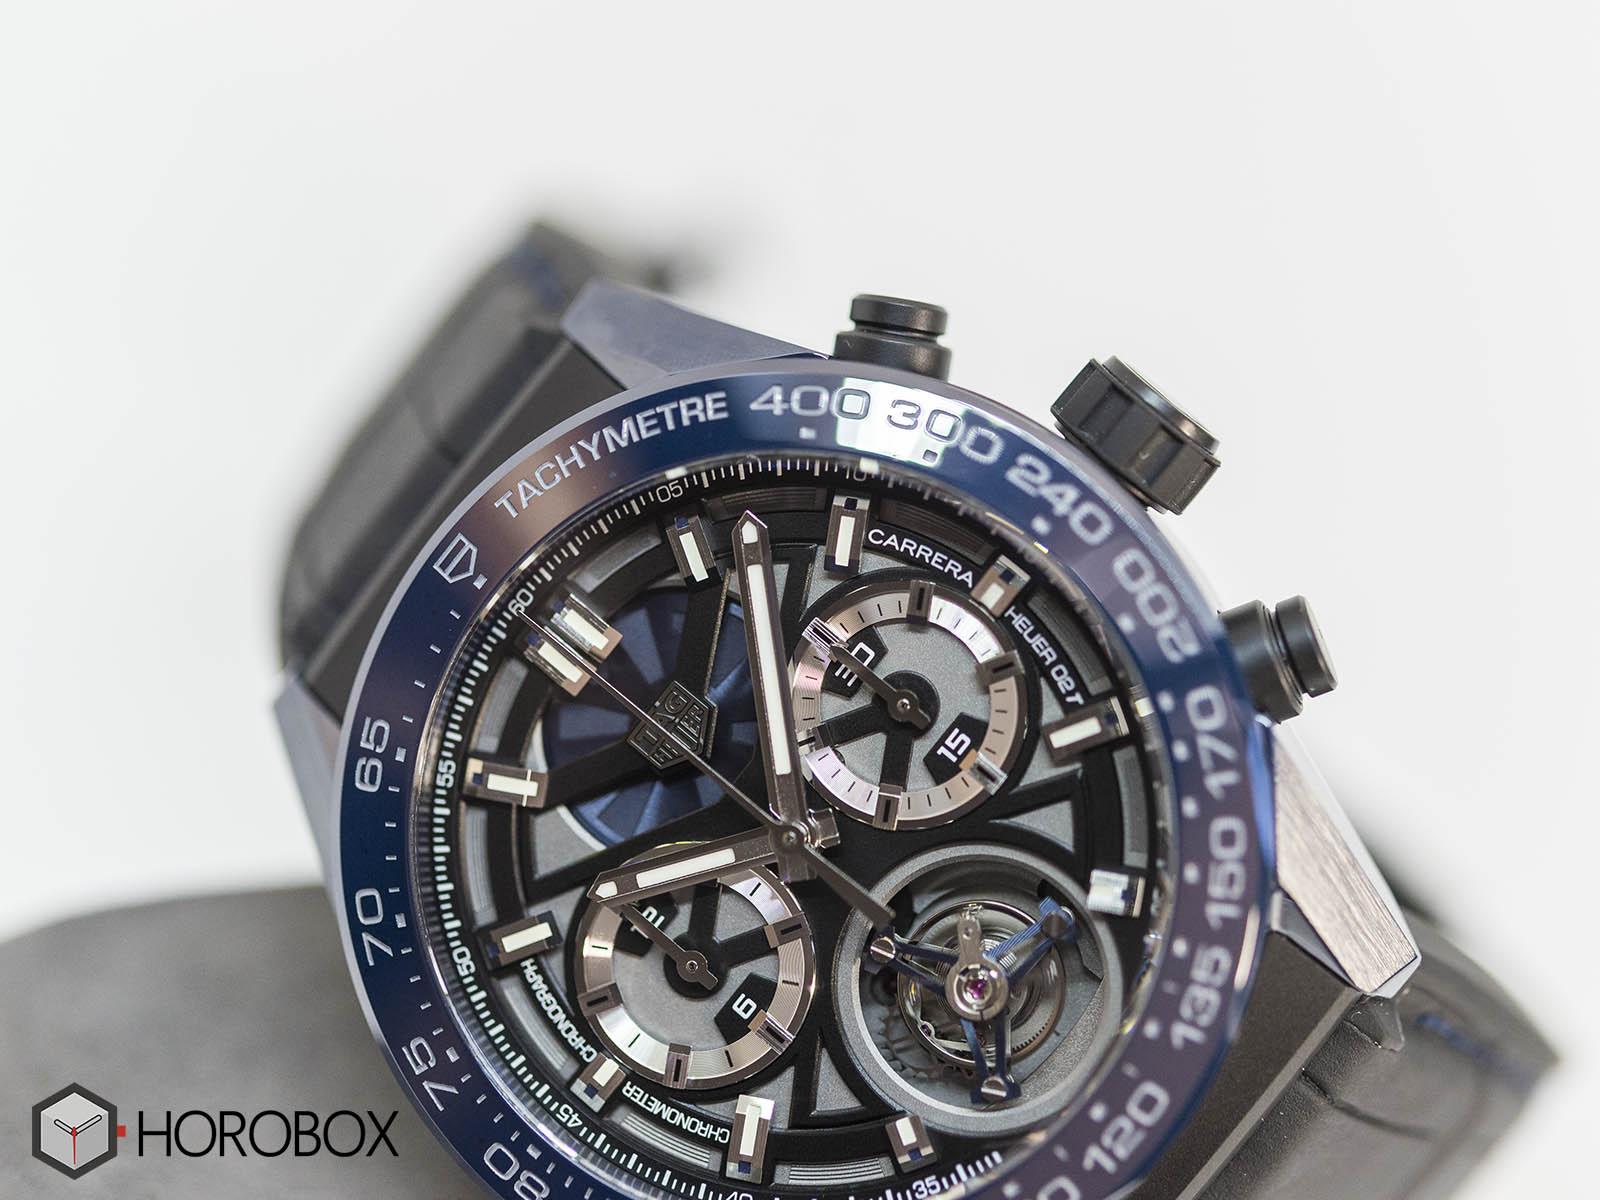 car5a93-fc6442-tag-heuer-carrera-chronograph-tourbillon-chronometer-1.jpg